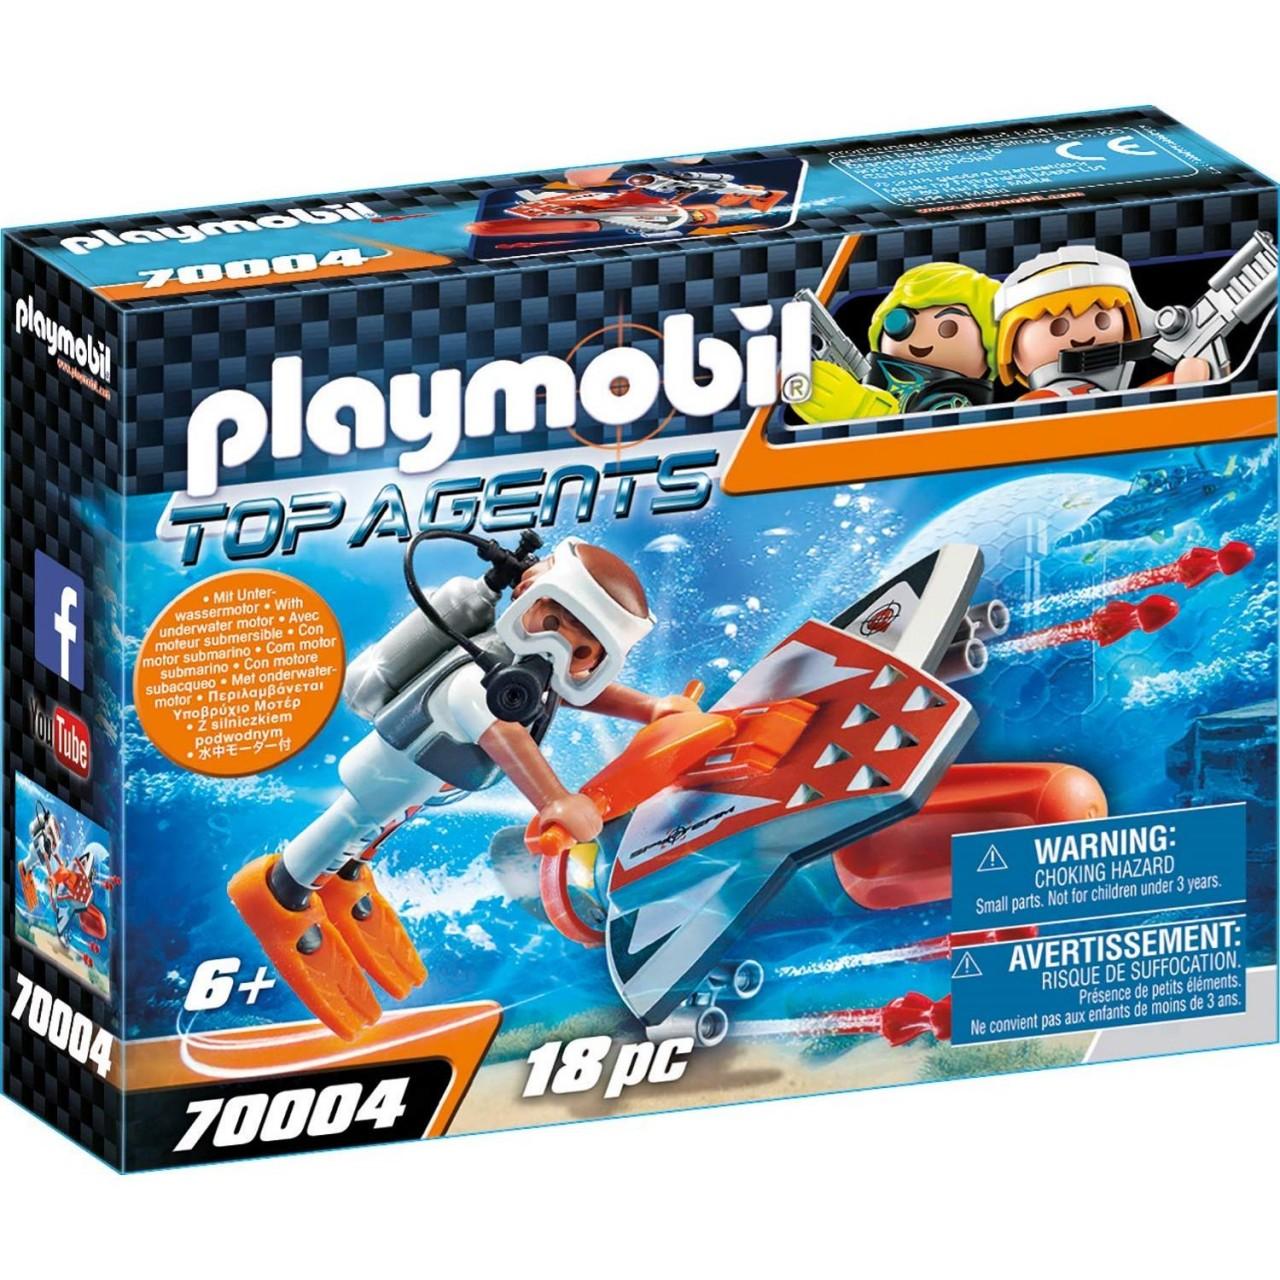 Playmobil 70004 SPY TEAM Underwater Wing